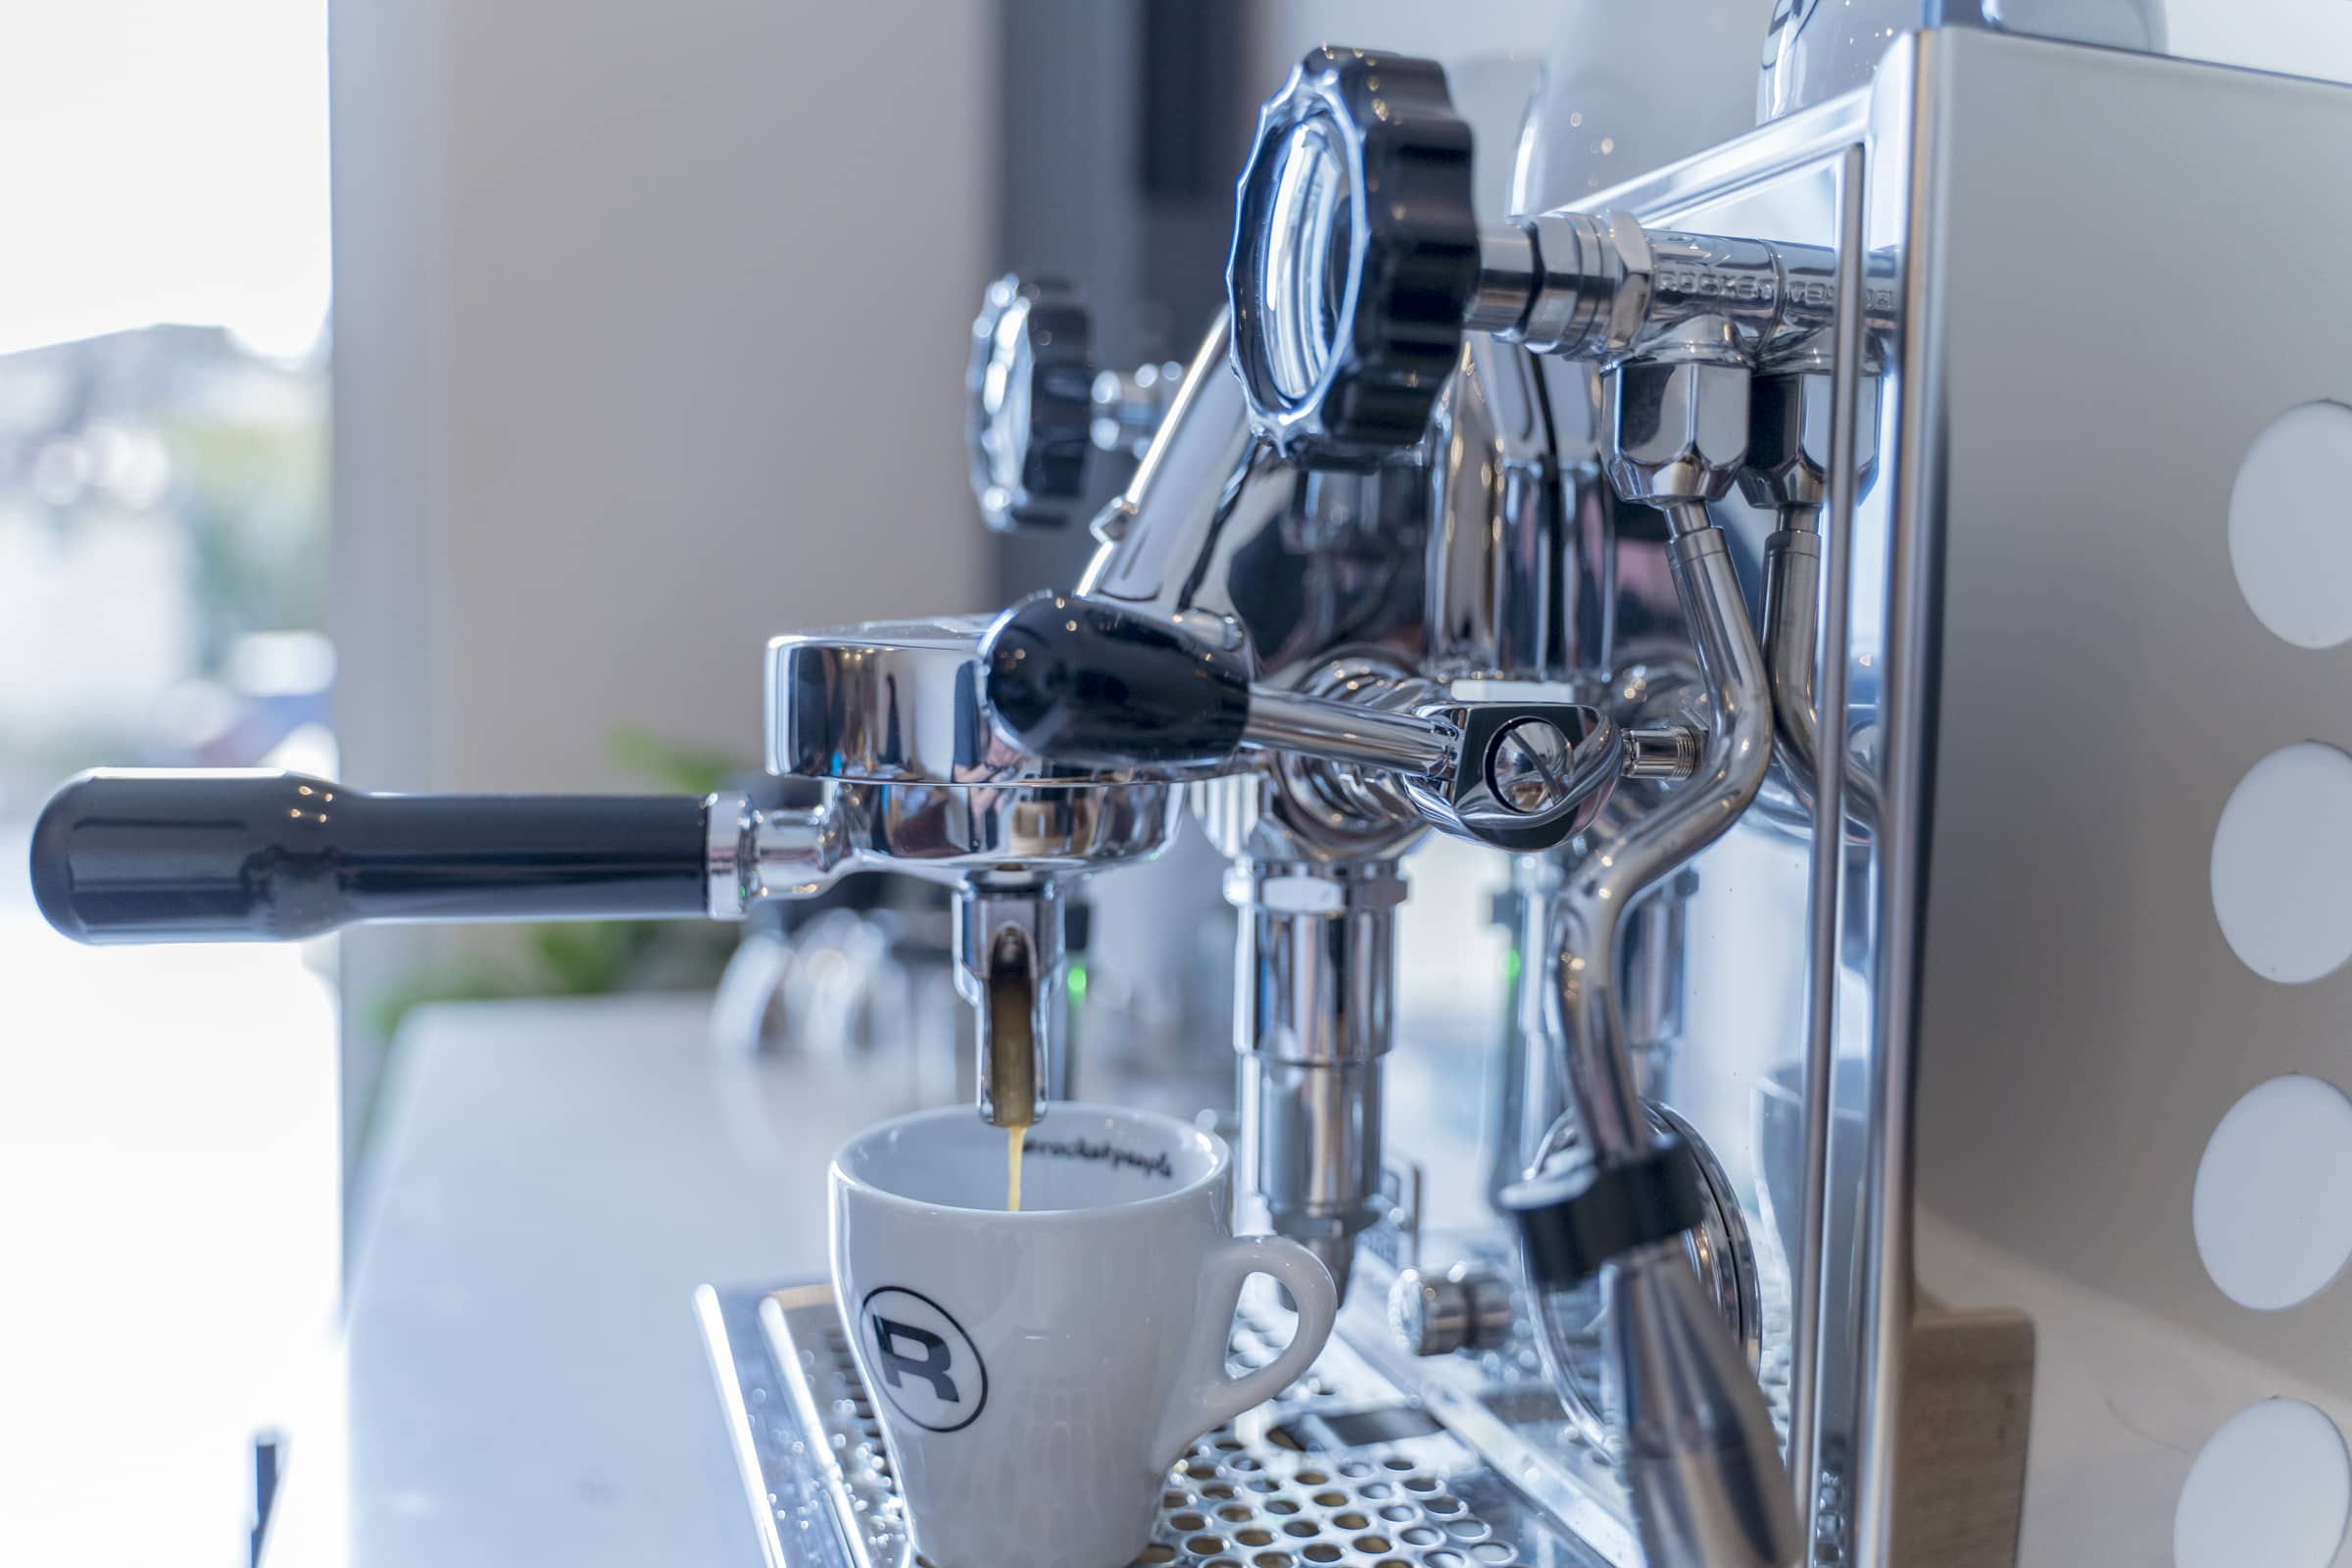 Omnino Specialty coffee